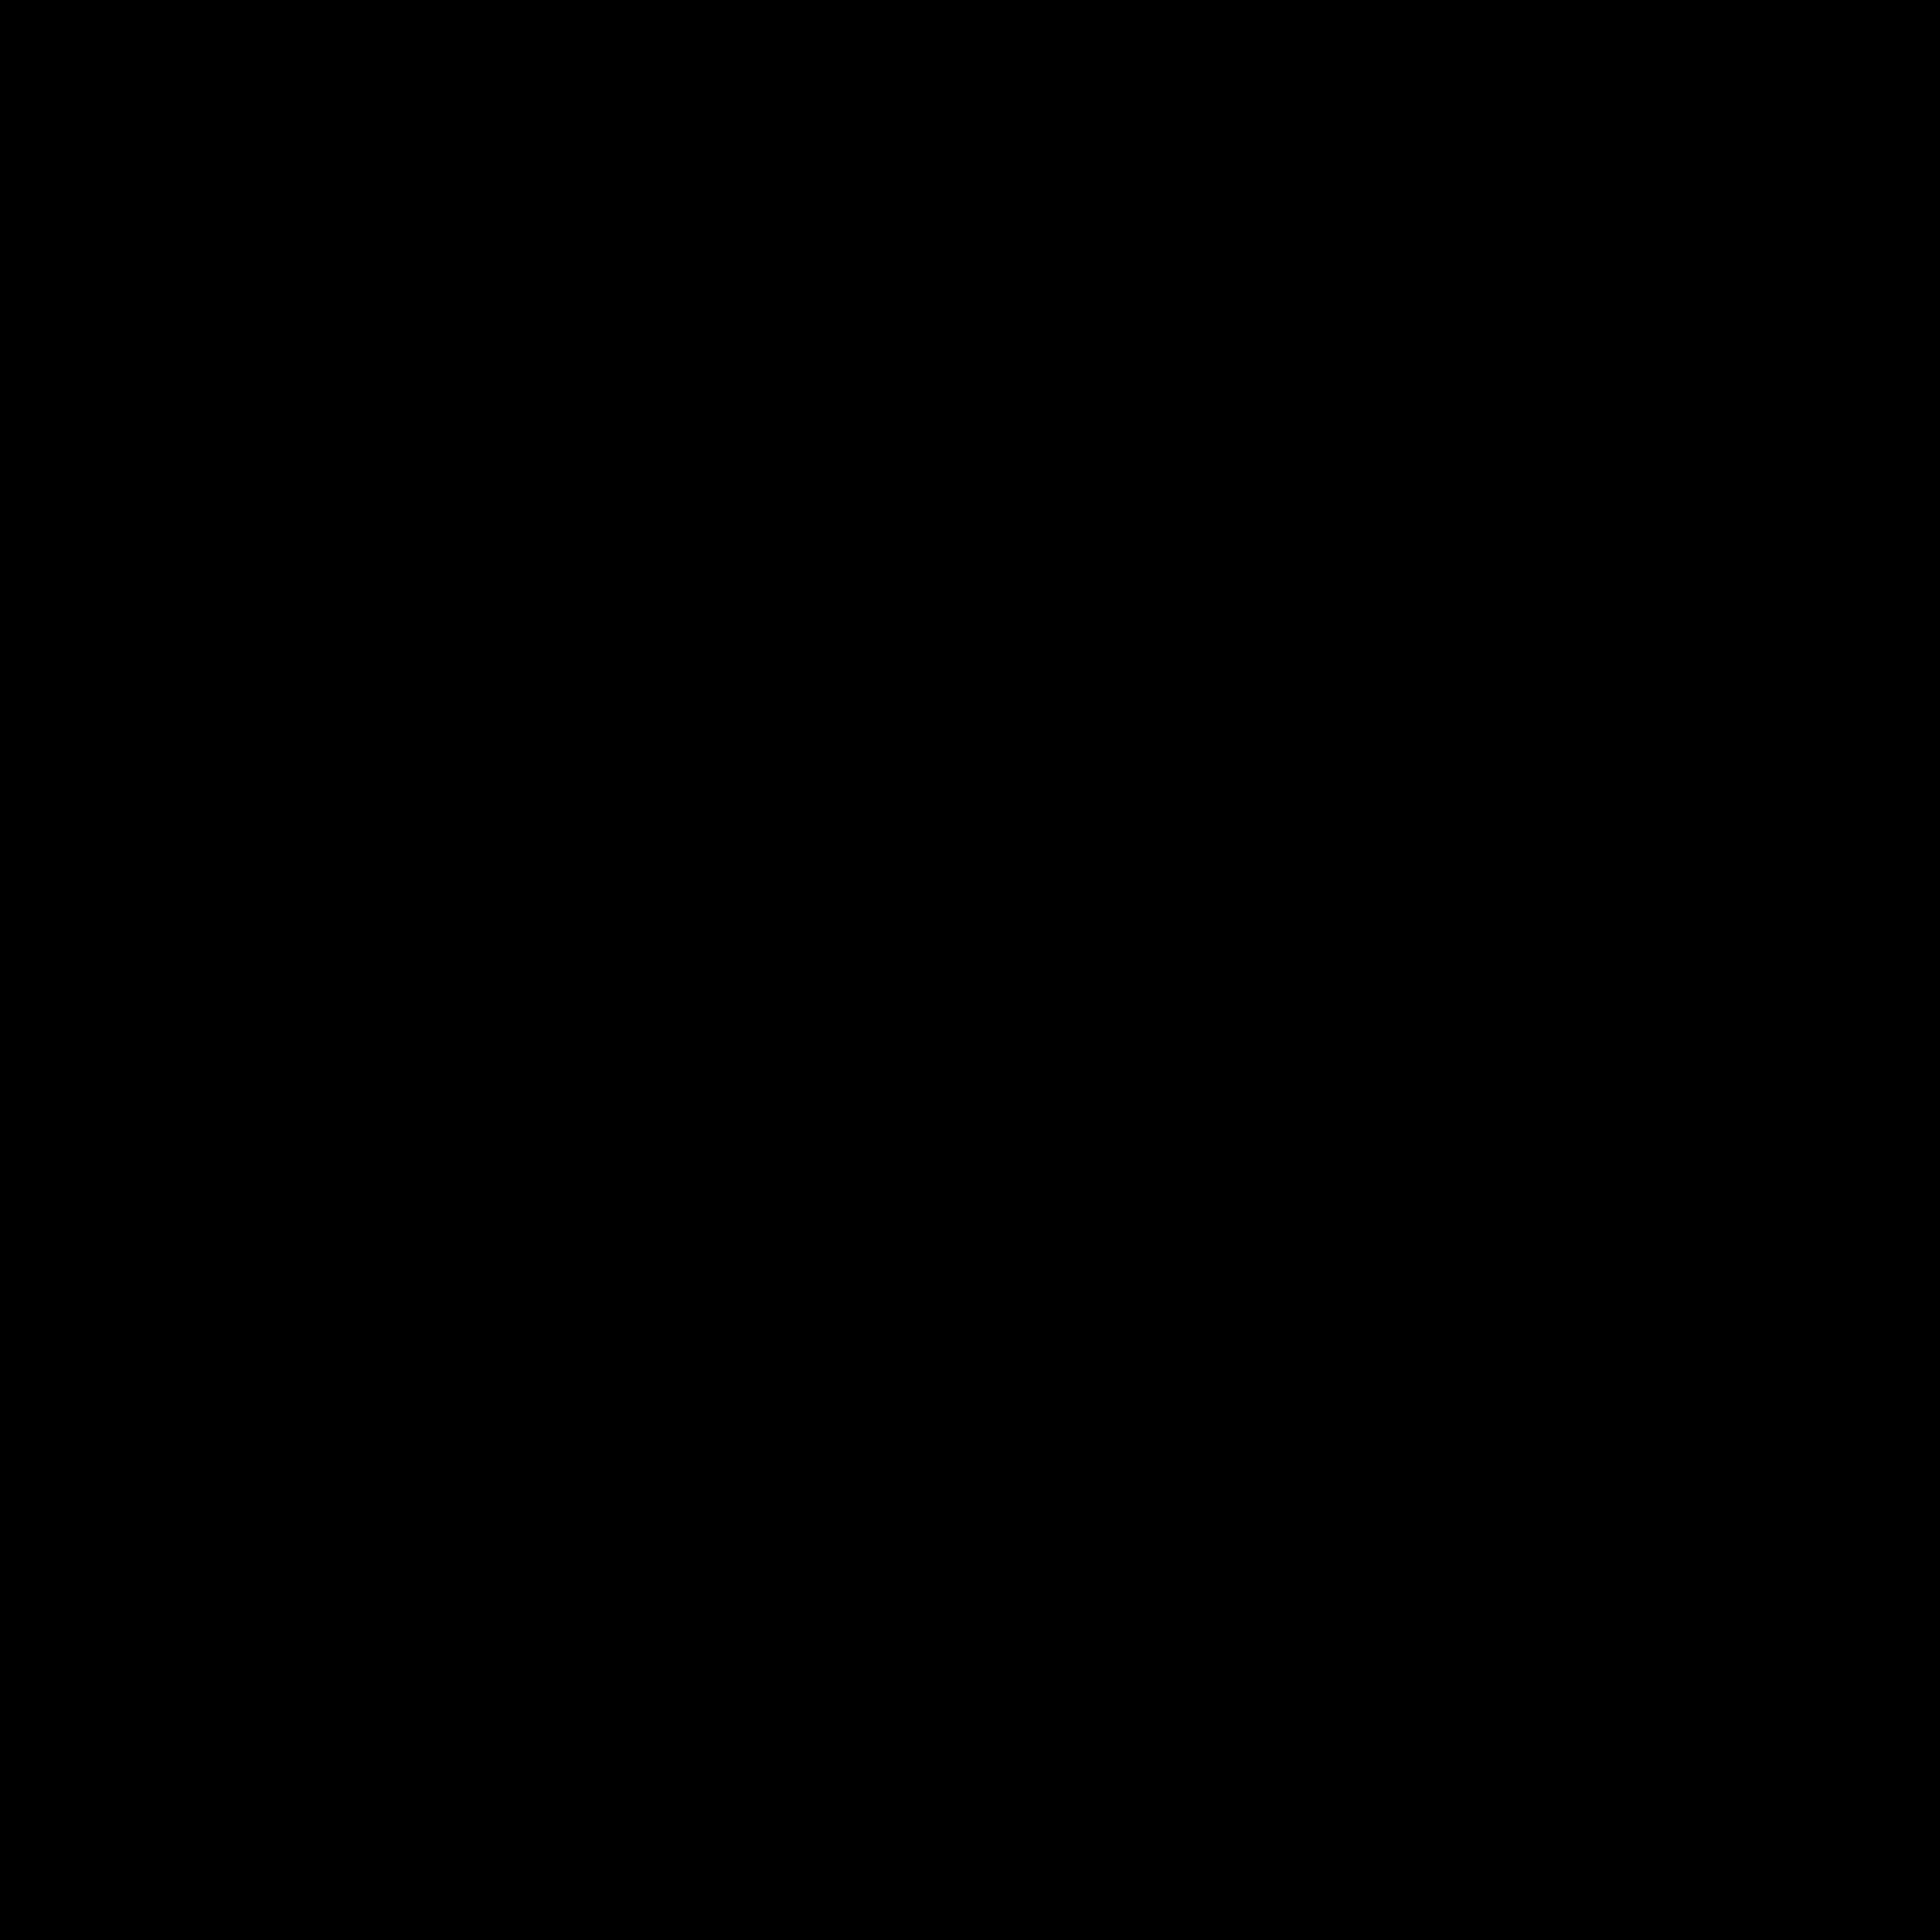 Download Facebook Logo Circle Black Transparent.